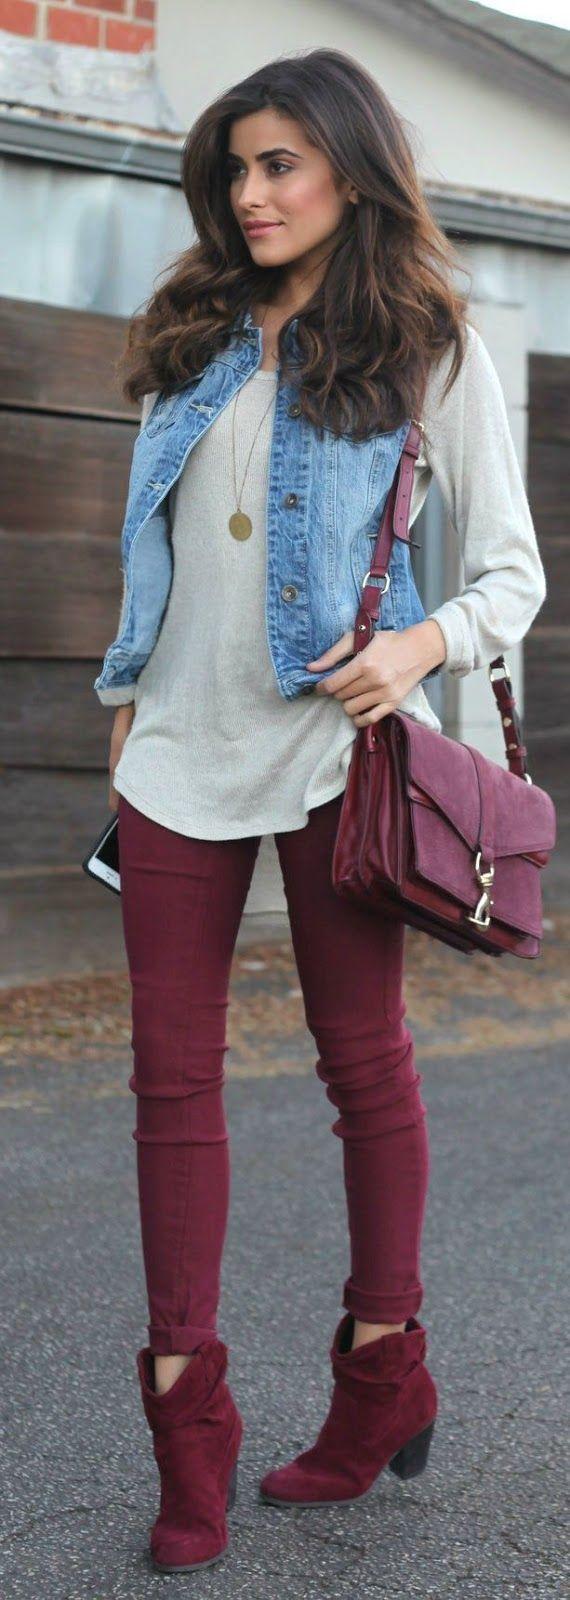 Street style denim jacket and burgundy pants